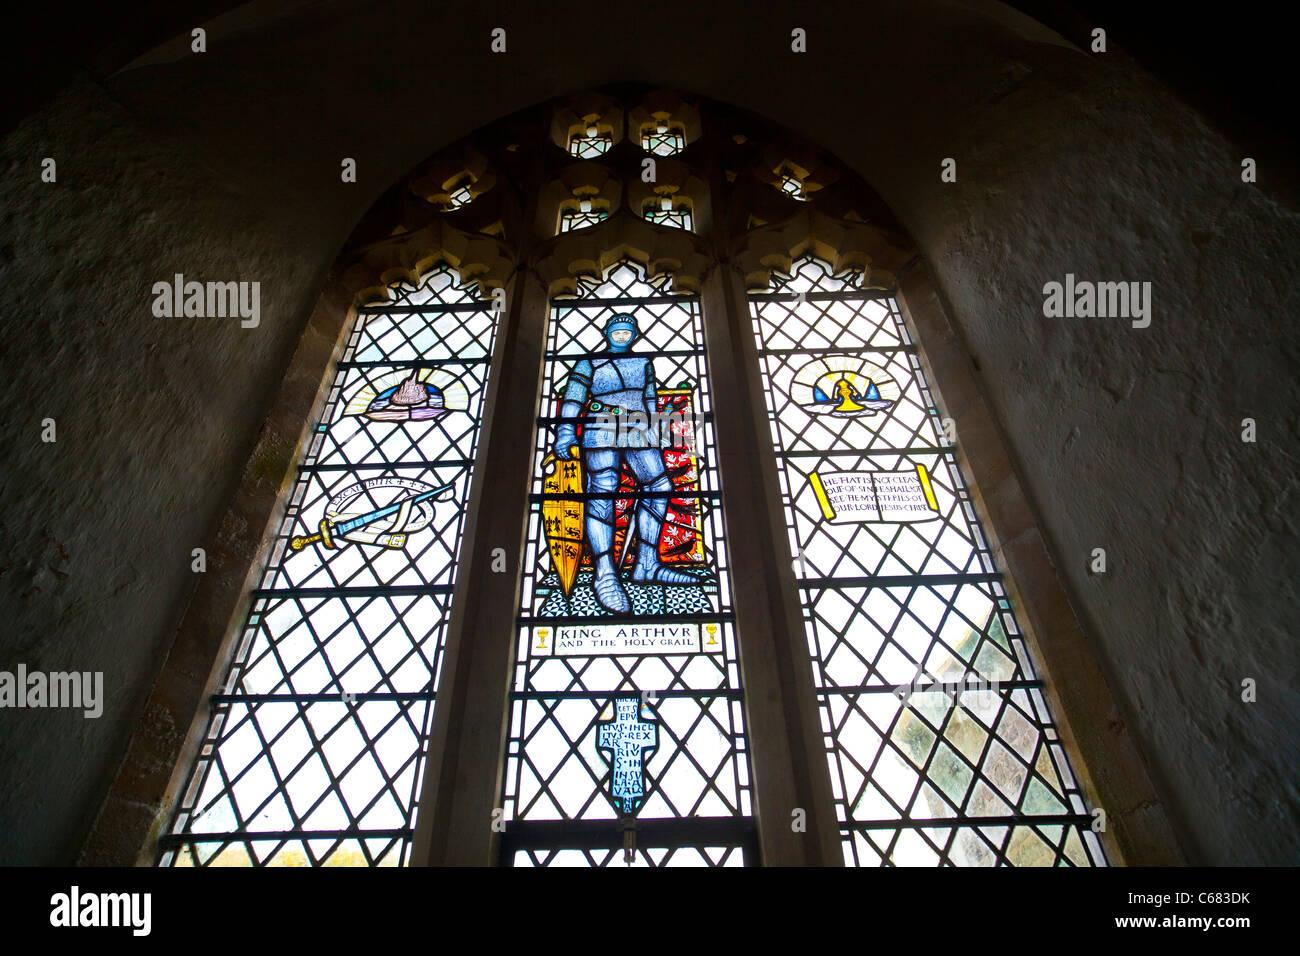 Hero King Arthur Stockfotos und bilder Kaufen Alamy